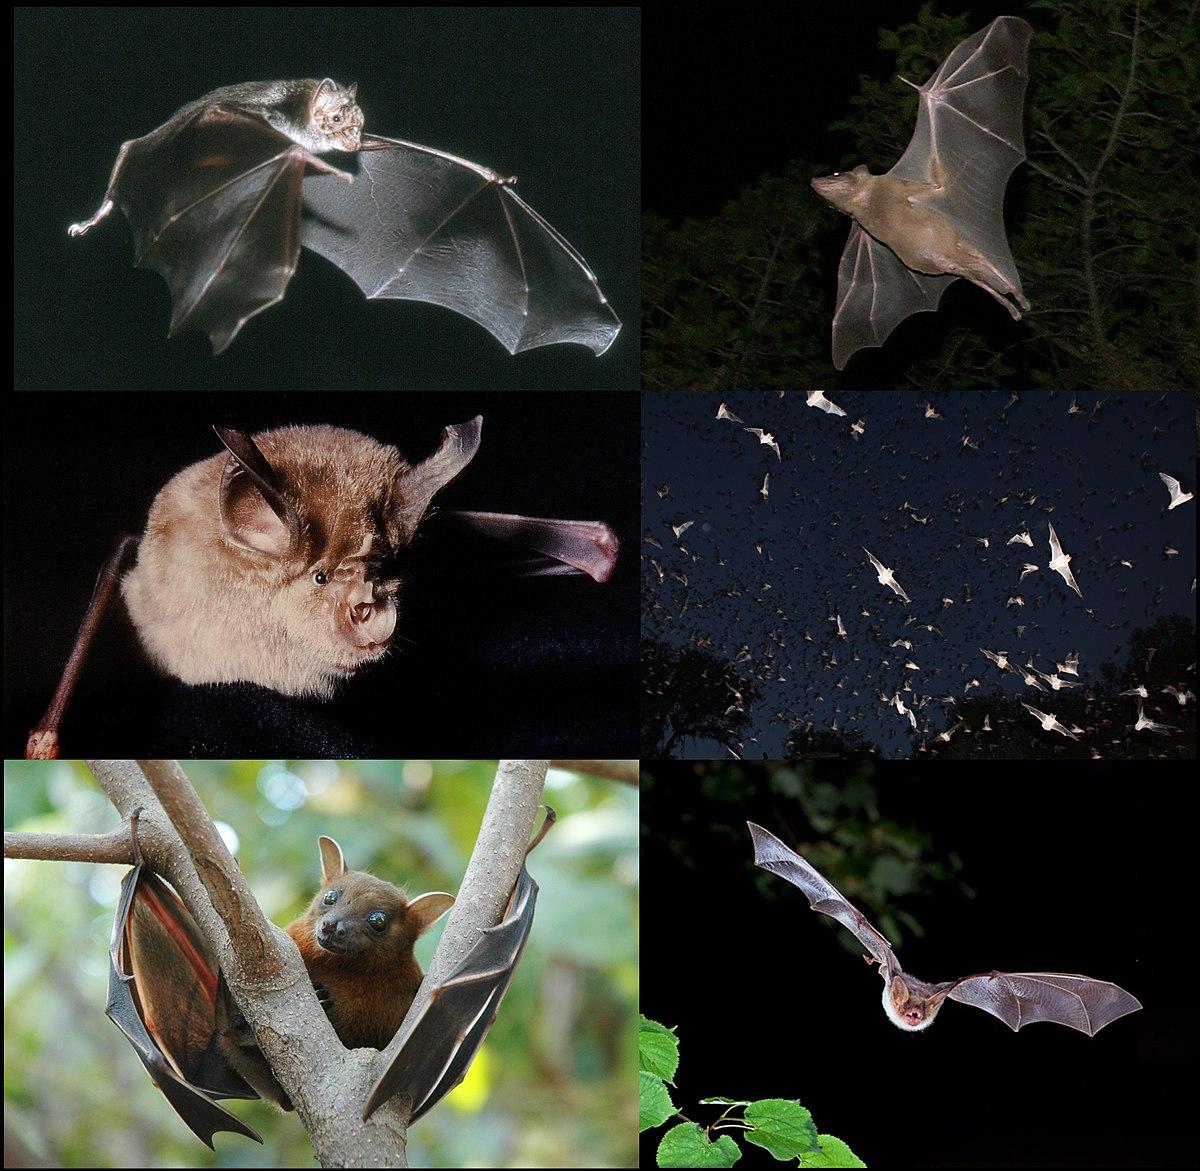 Bat Wikipedia